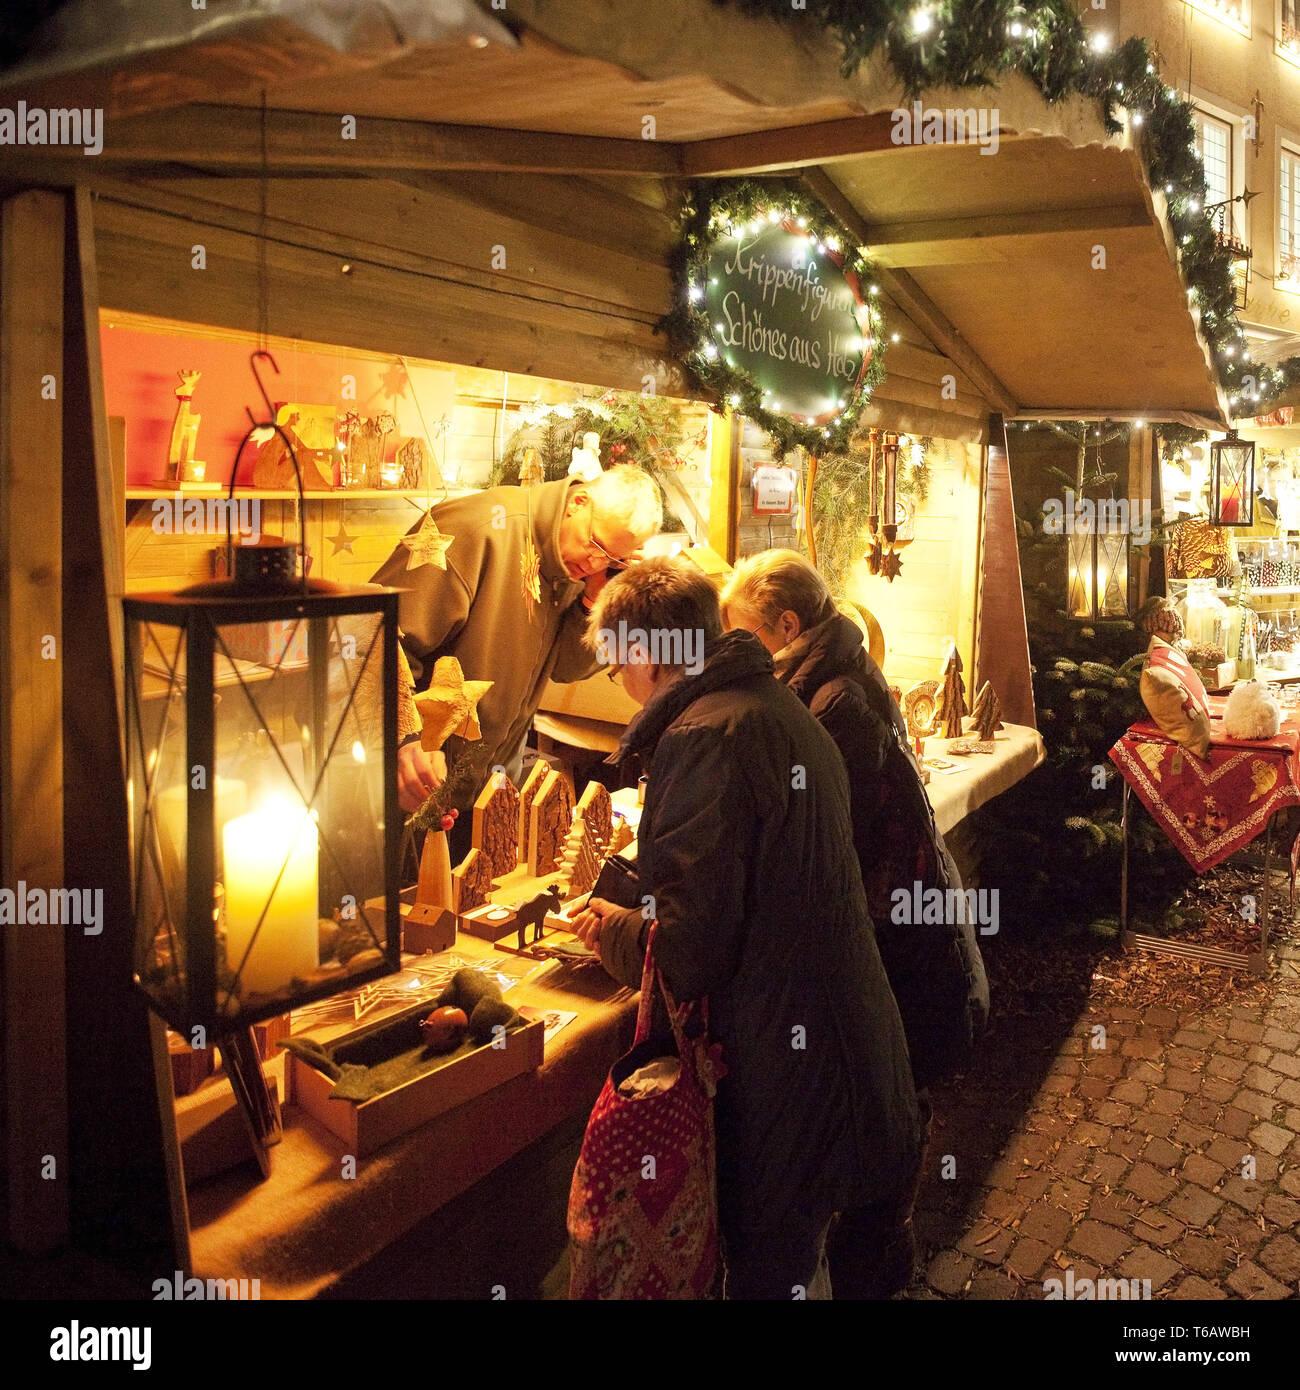 People on the Christmas market, Warendorf, Muensterland, North Rhine-Westphalia, Germany - Stock Image